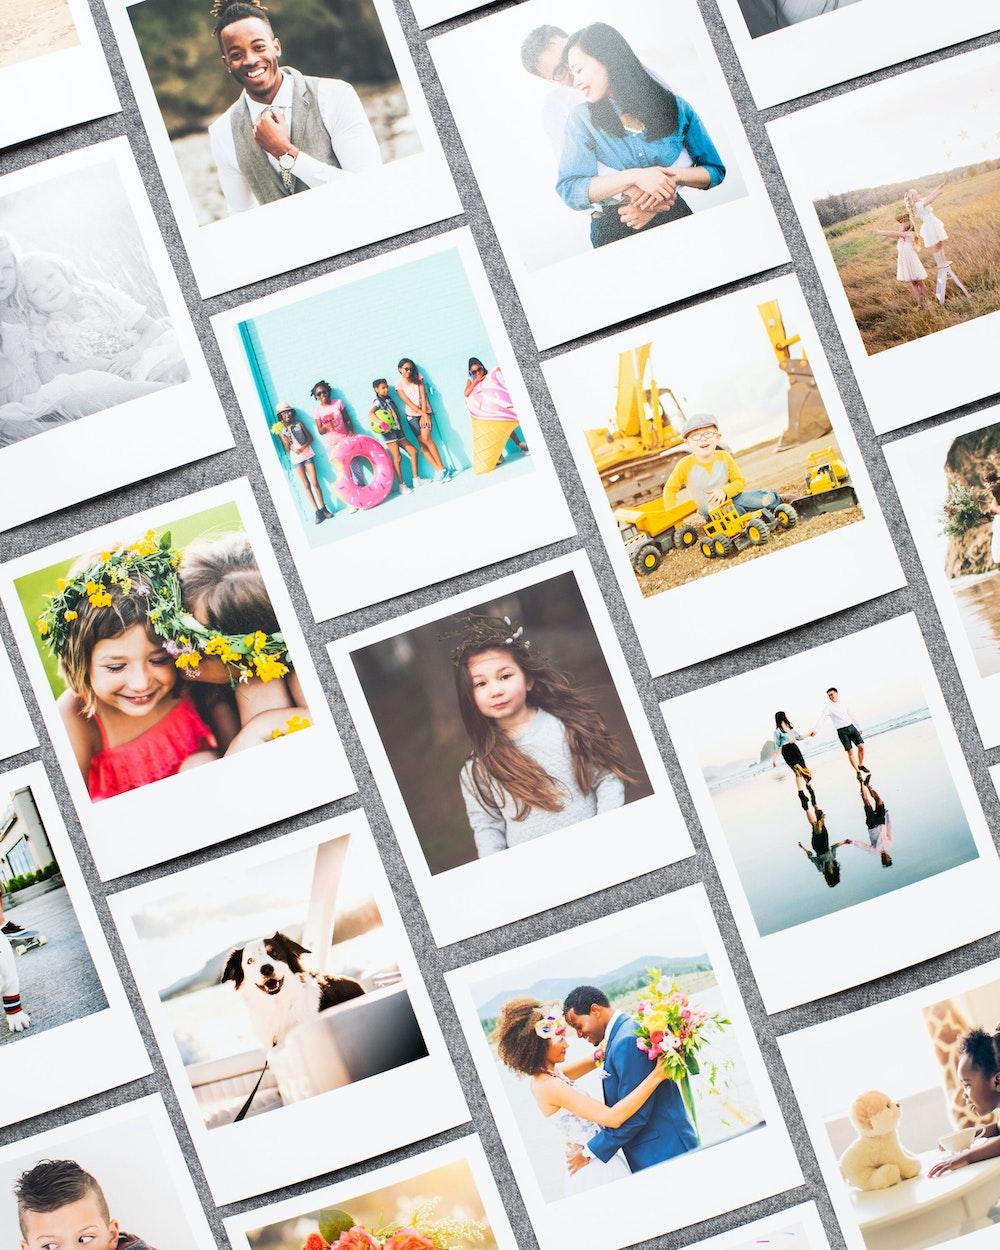 Collage of multiple Mini Snapshot prints